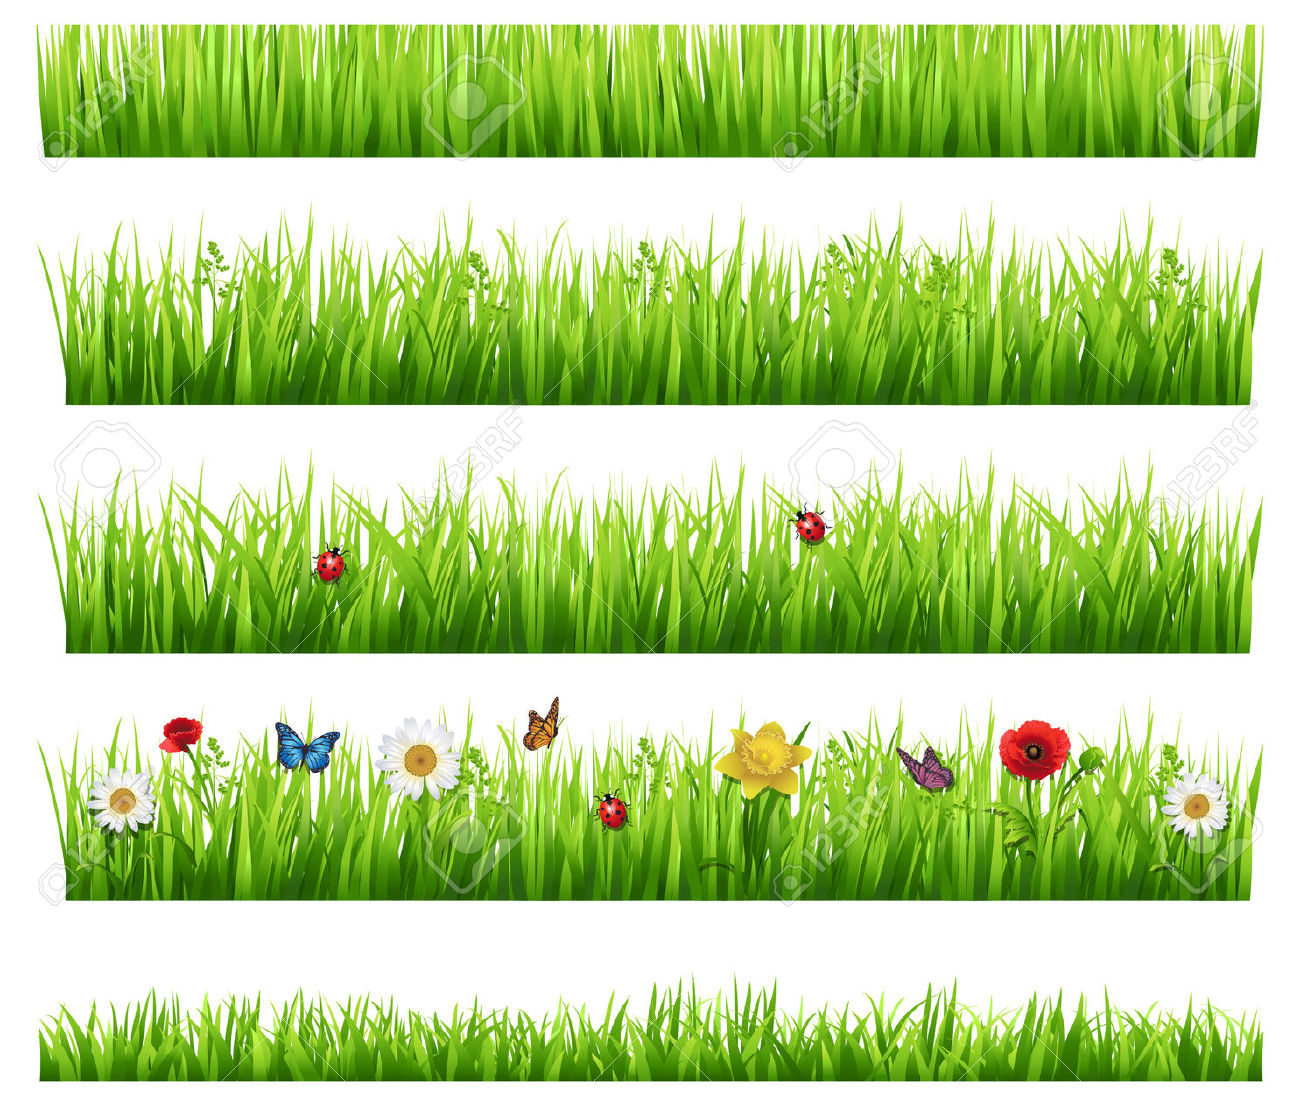 Clipart grass grassland. Free grasslands cliparts download